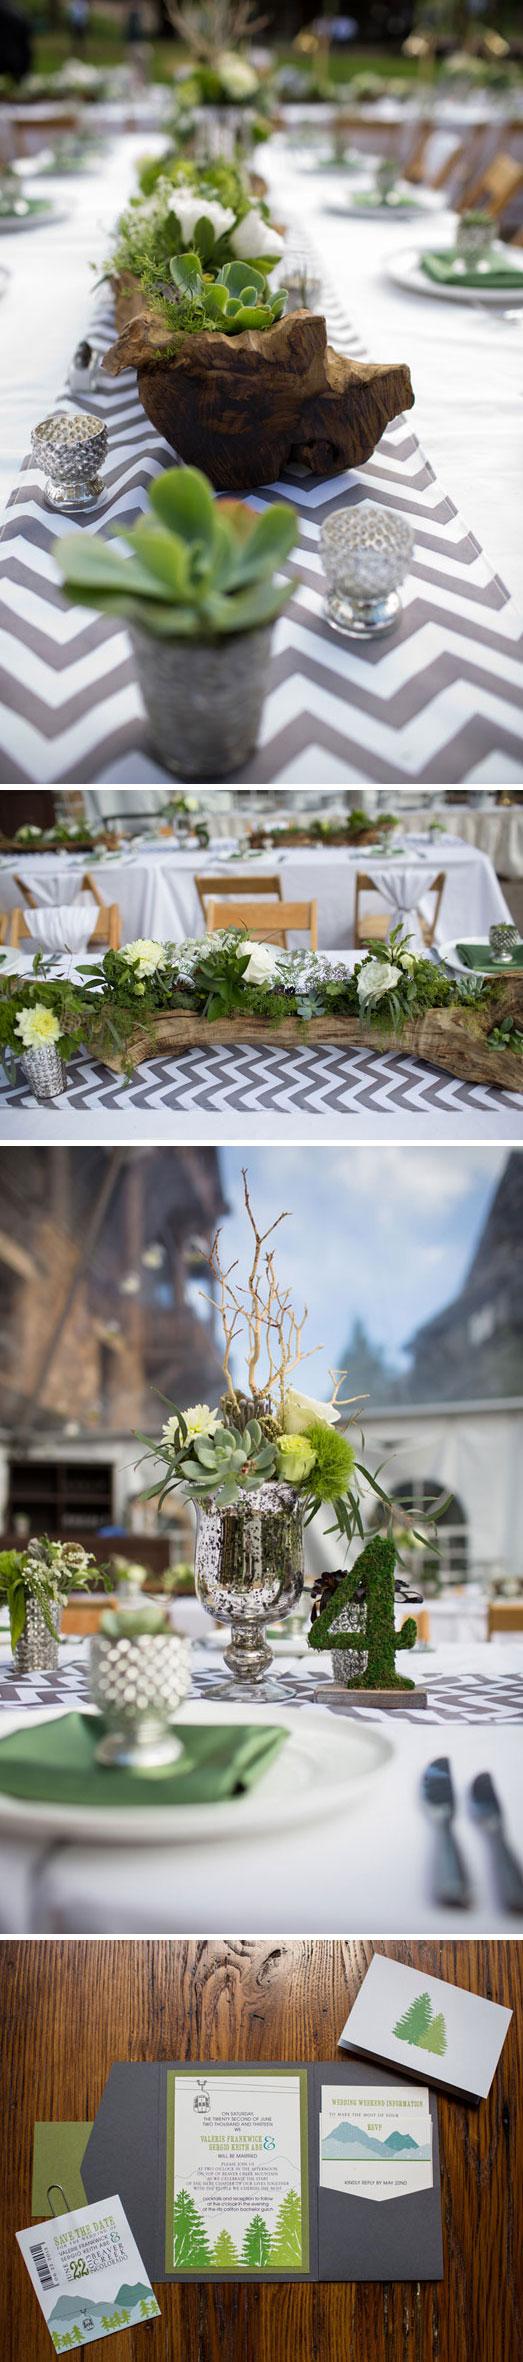 Natural & Woodsy Wedding